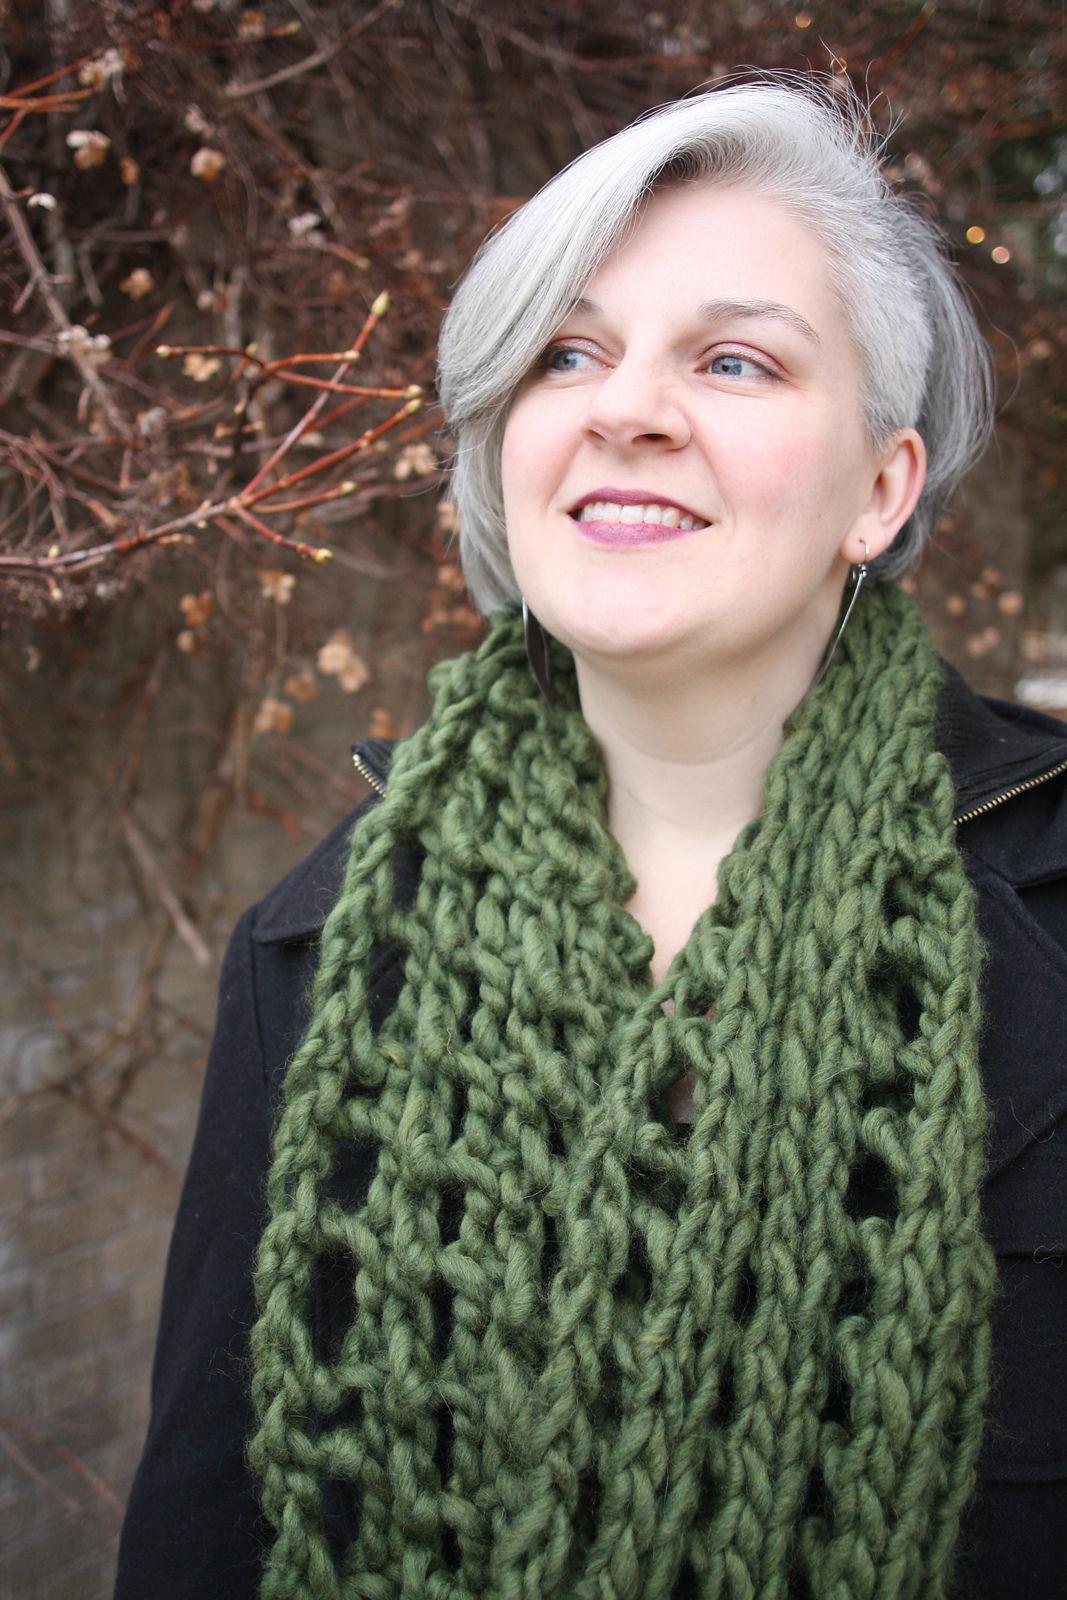 Women's long cowl Hominy. Free knitting pattern (lace, mesh).